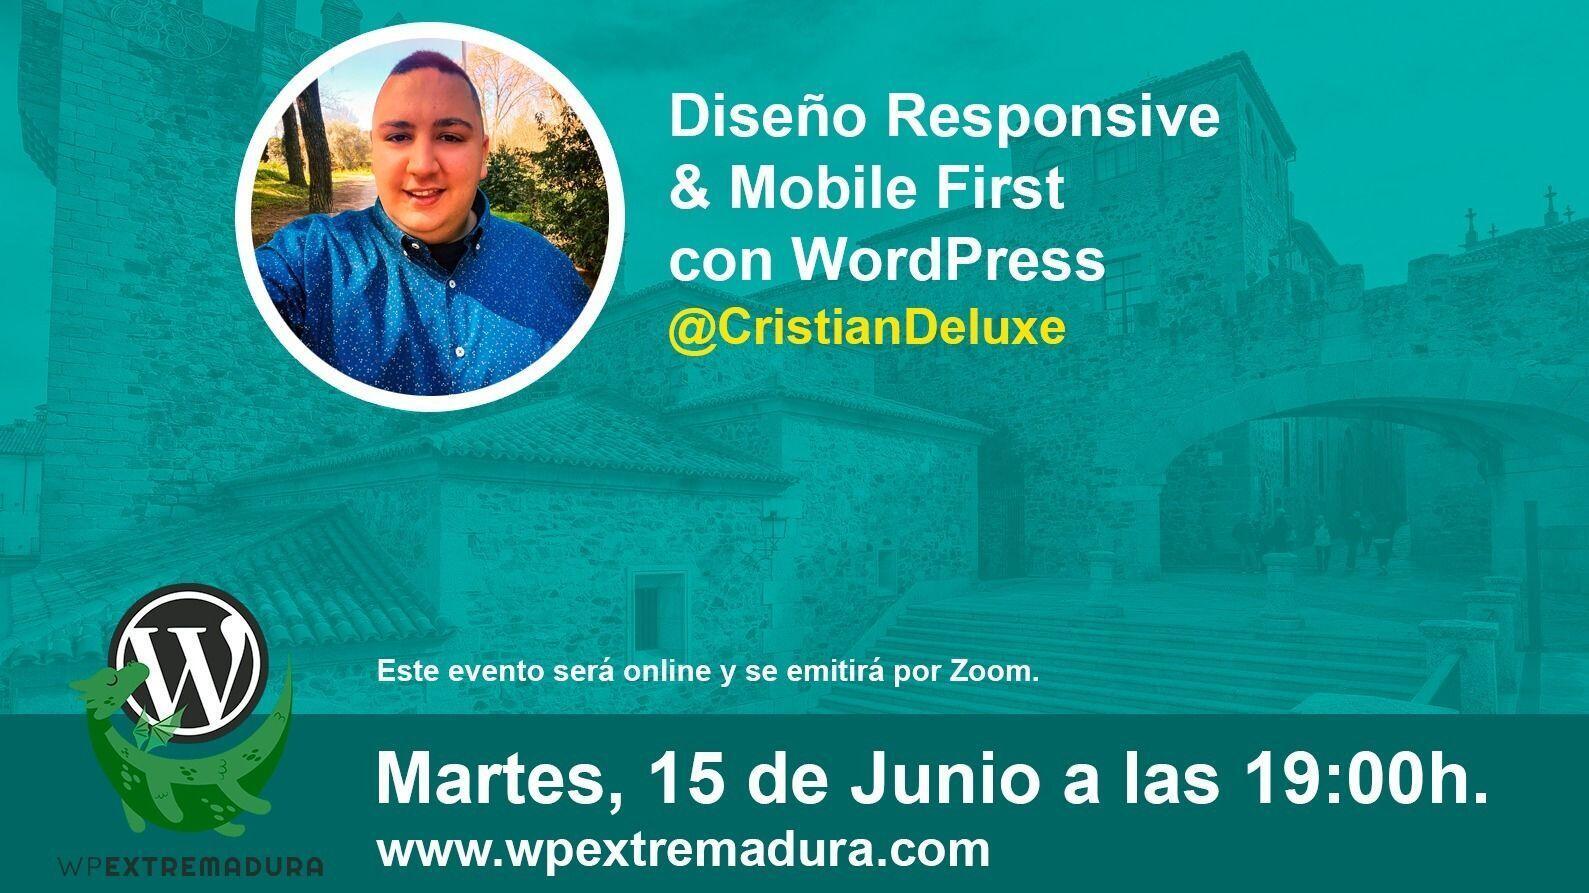 Diseño Responsive & Mobile First con WordPress